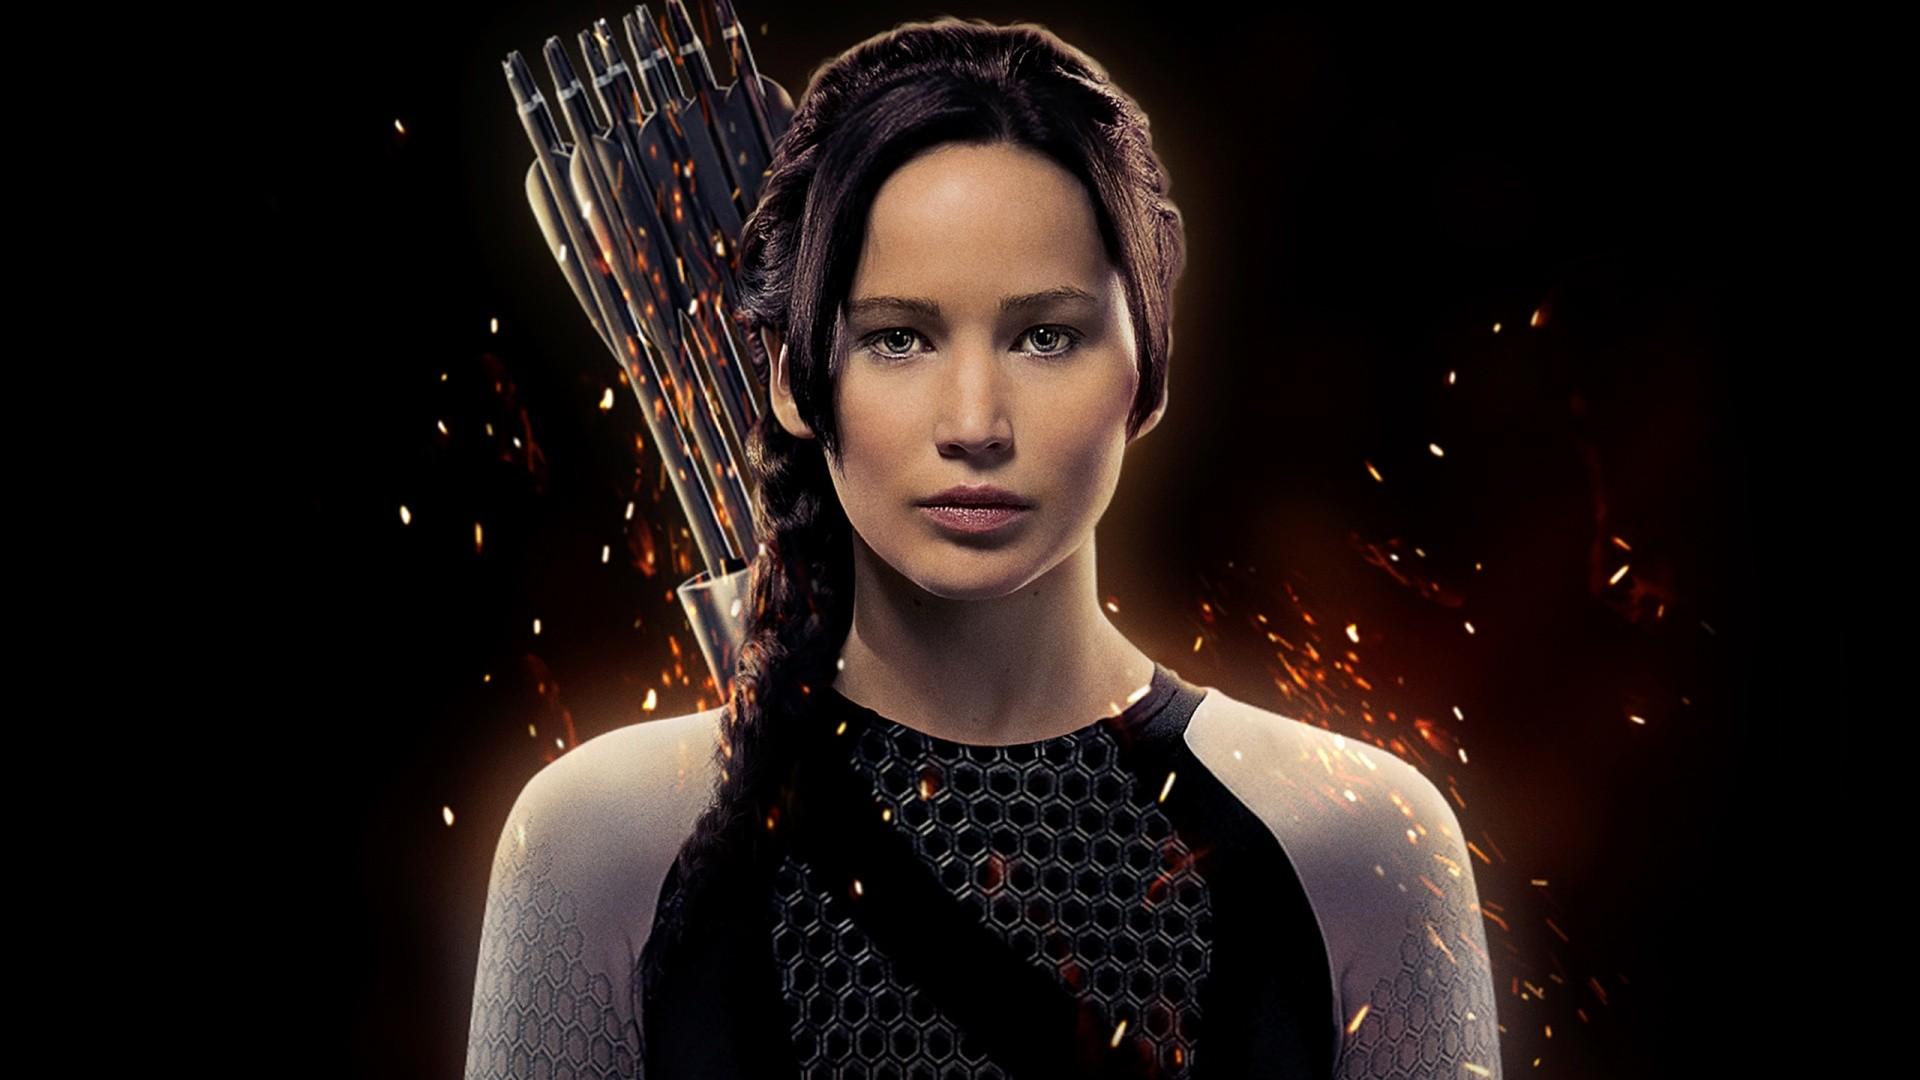 Jennifer Lawrence as Katniss Wallpapers